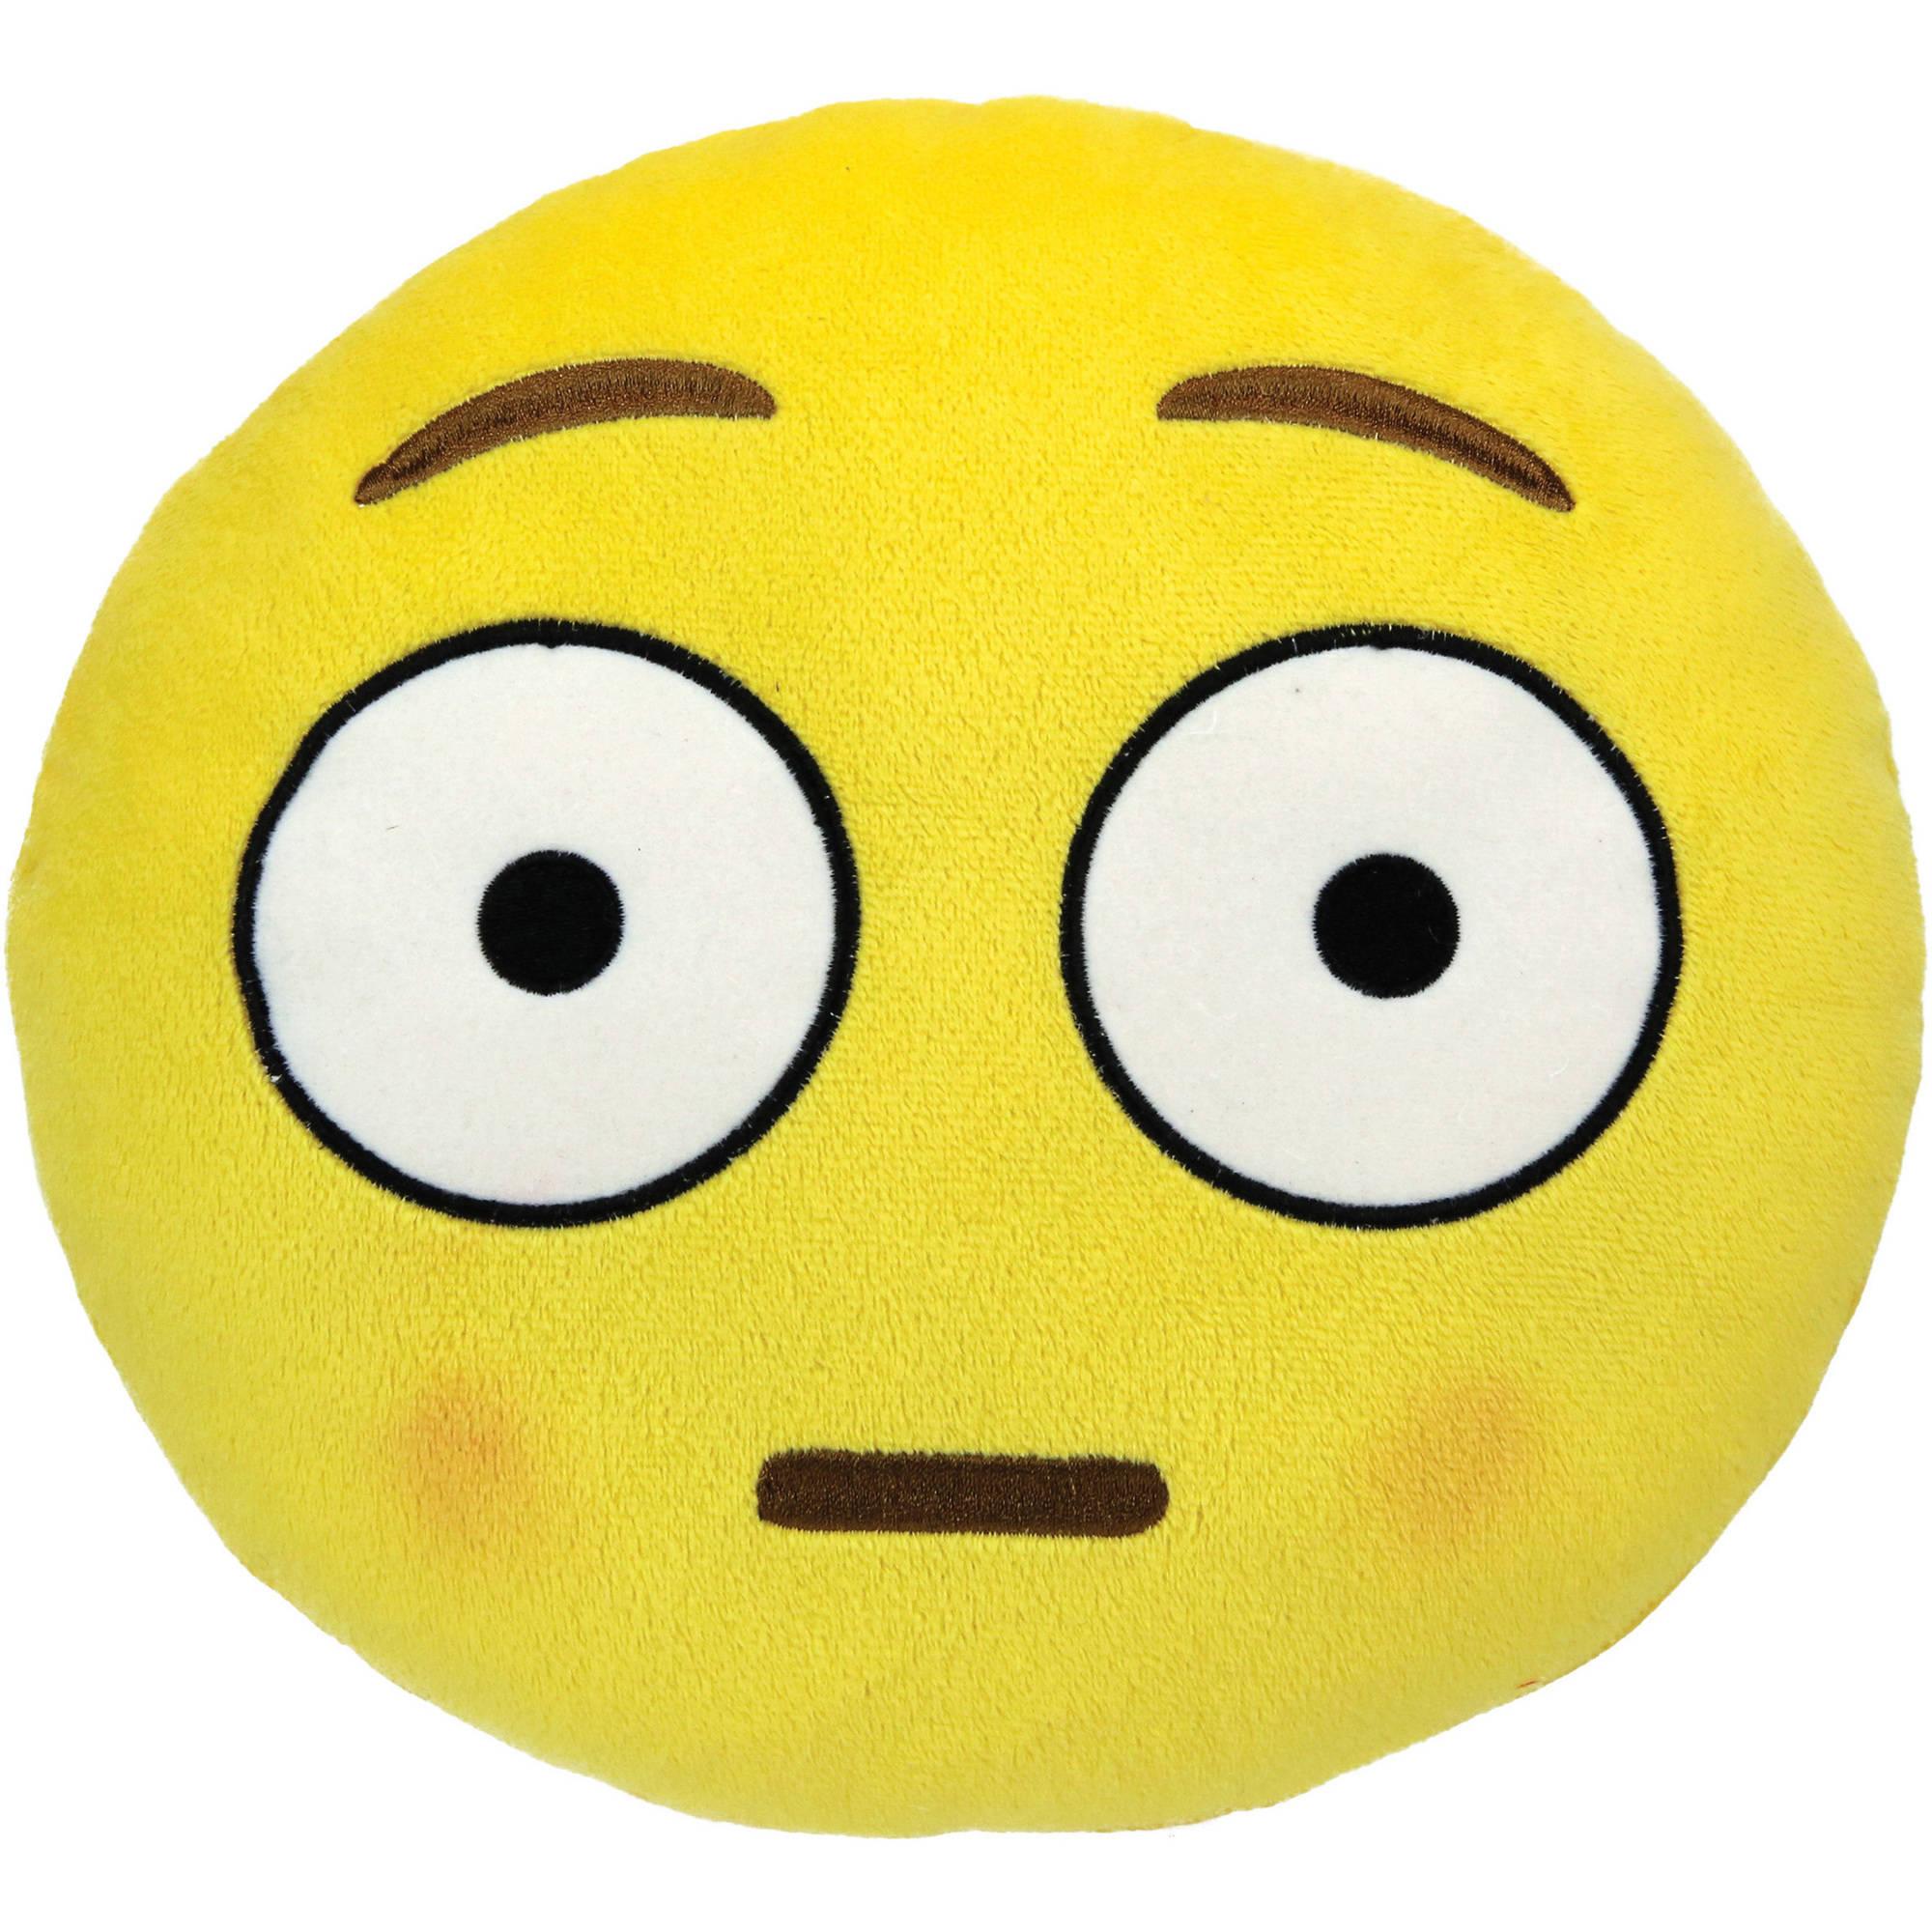 Emoji Small Pillow, Blushed Face